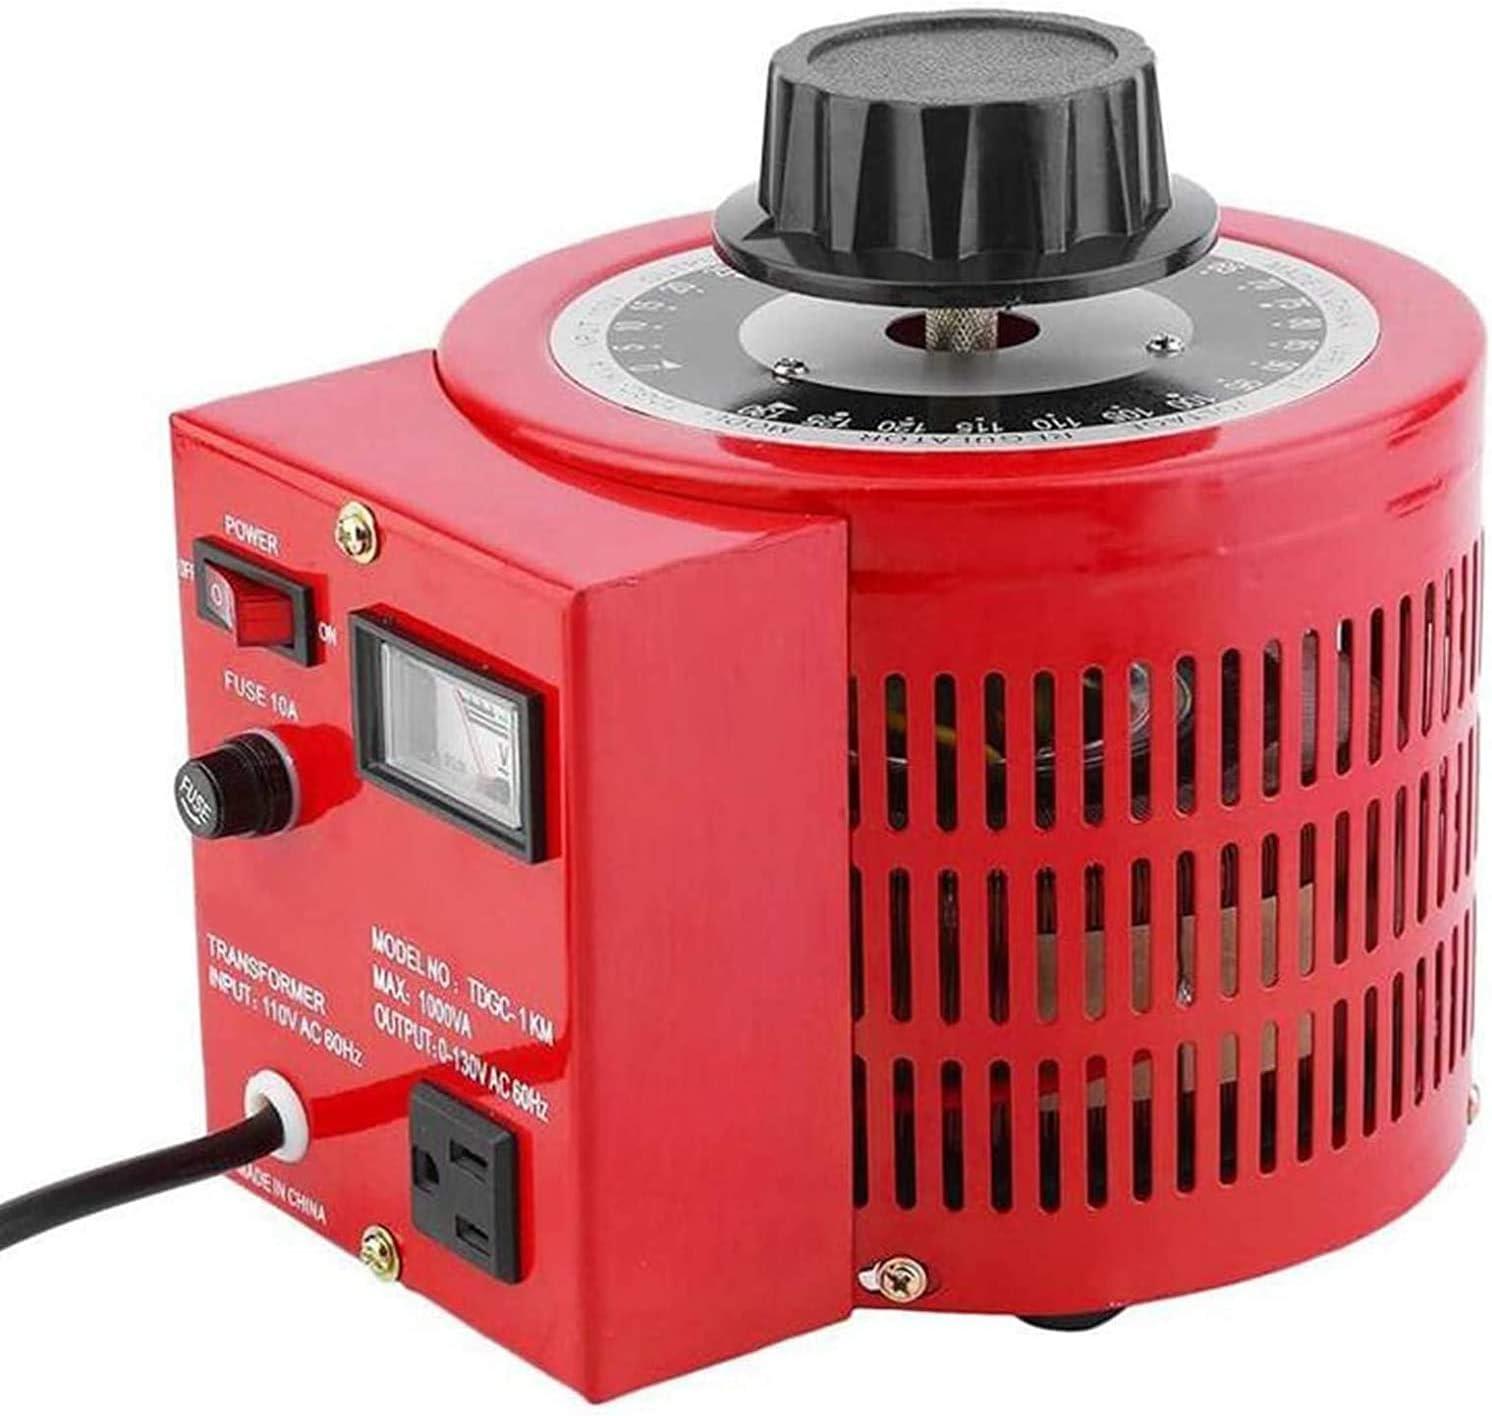 uyoyous 1000W Variable Transformer 0-130V Output ac Variable Voltage Converter Transformer 10Amp ac Variable Voltage autotransformer Regulator for Industries Equipment Appliances